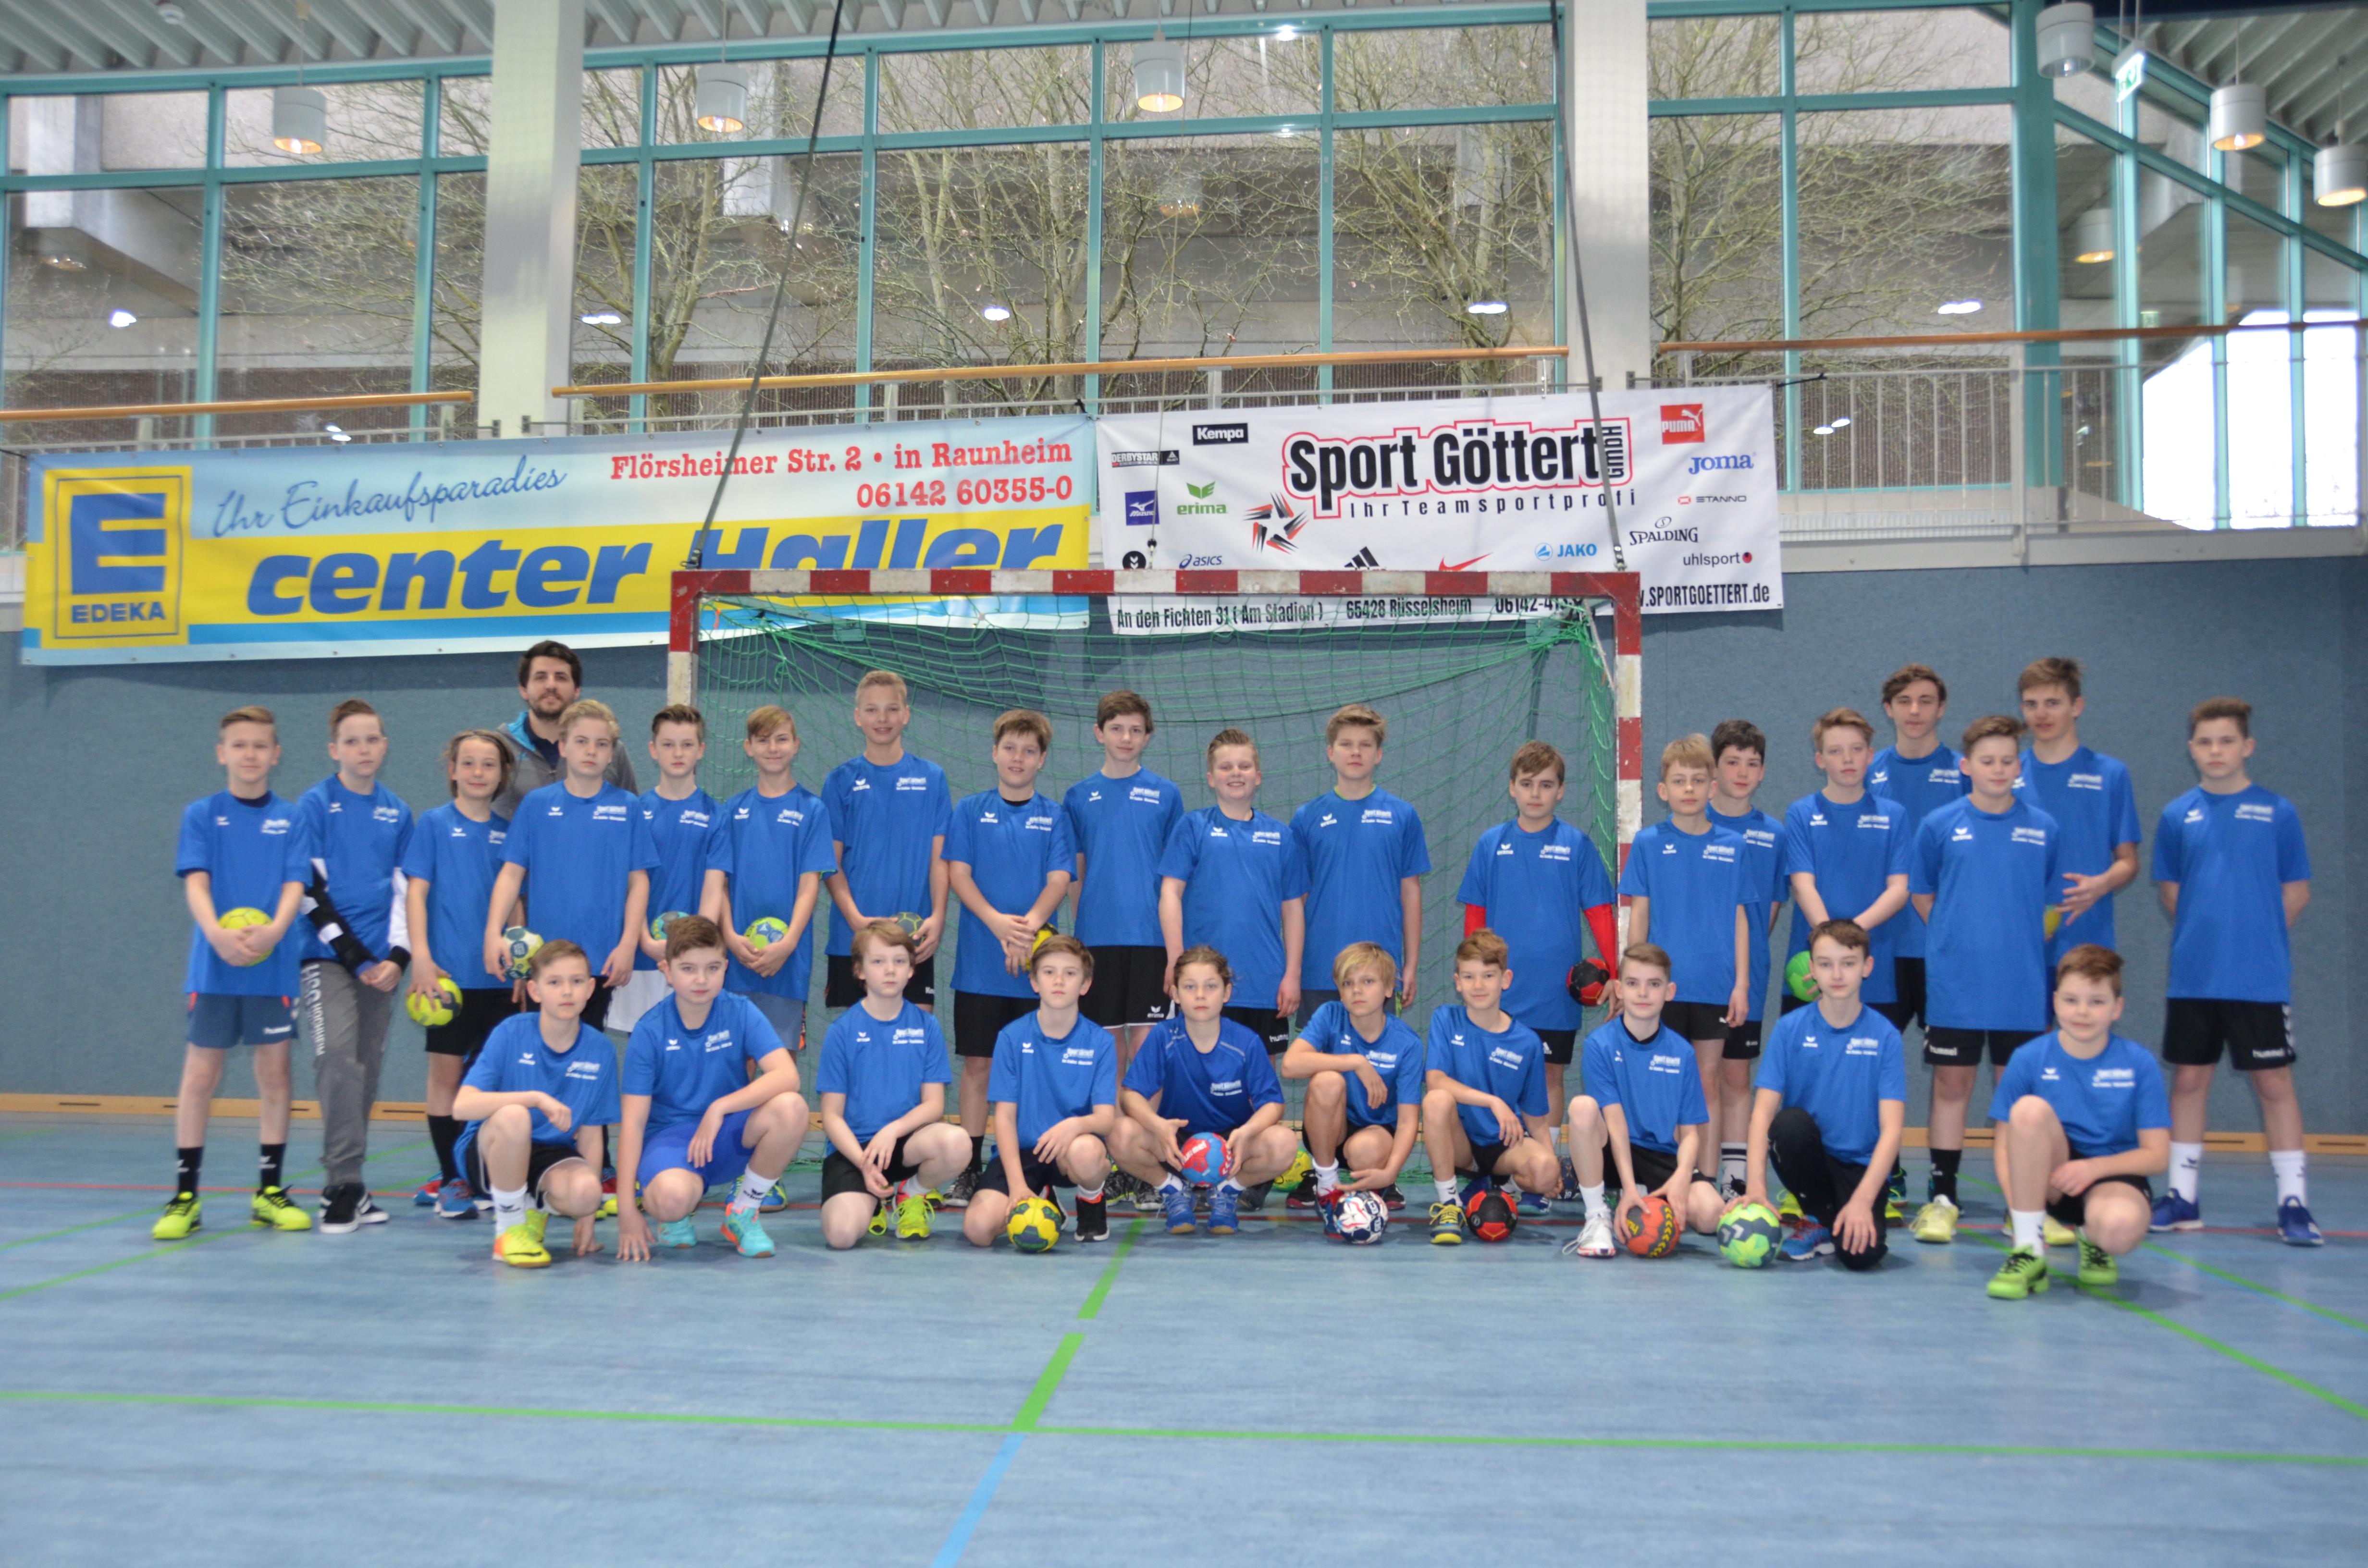 Osterferien Handball Junior Camp 2018 der HSG Hochheim